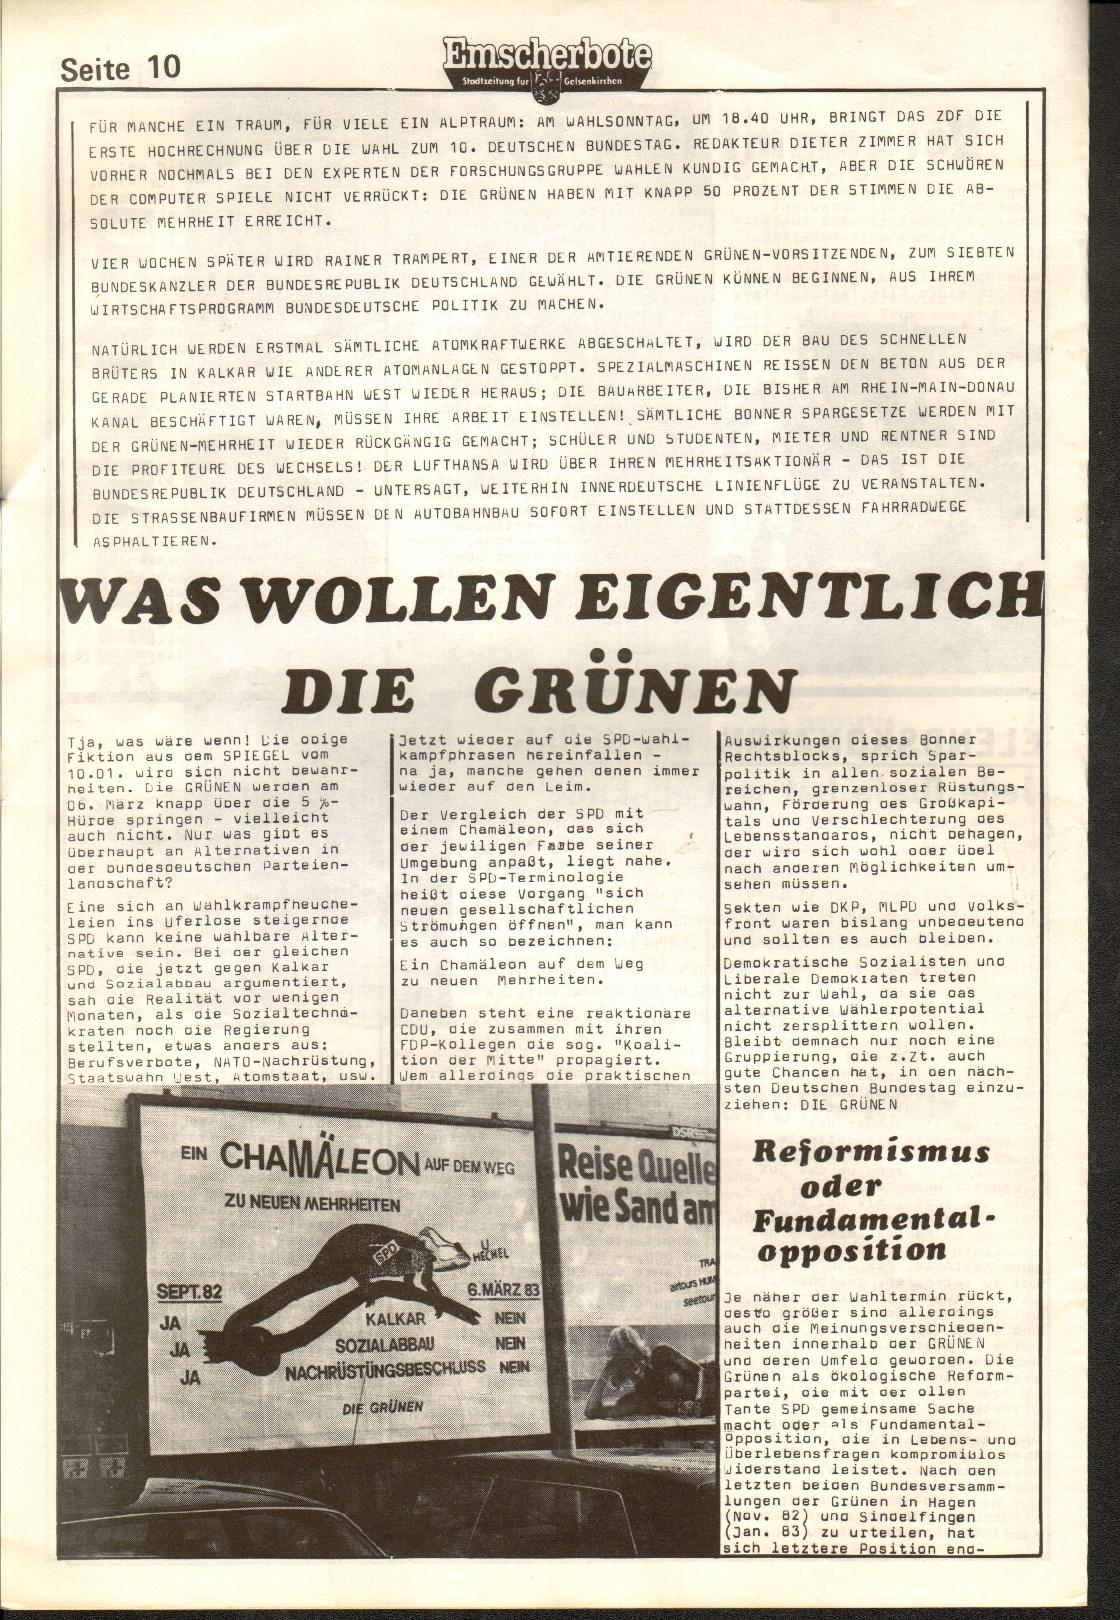 Gelsenkirchen_Emscherbote_1983_25_10